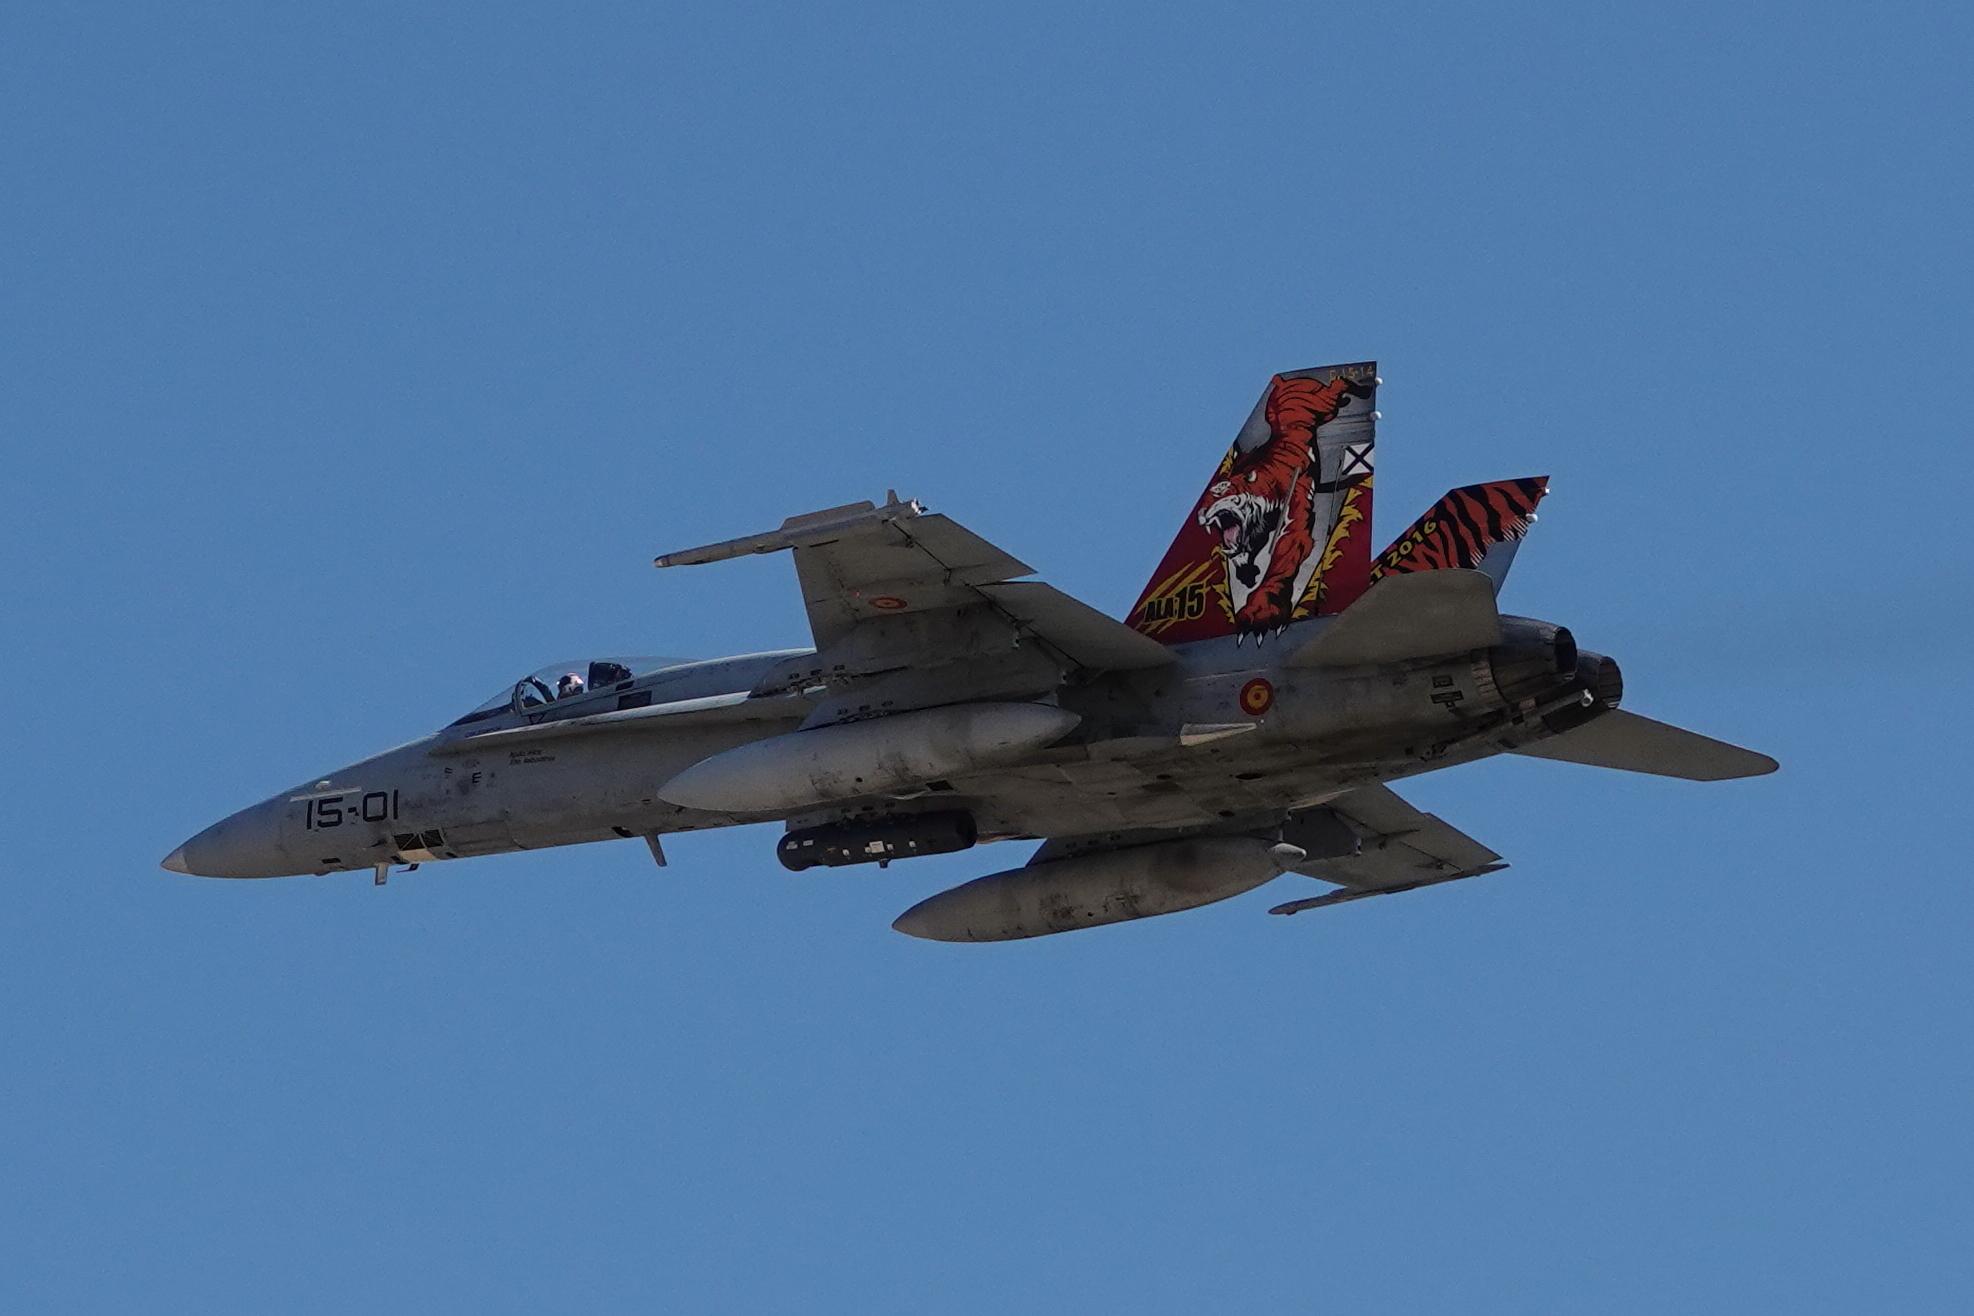 F-18 15-01 (2)